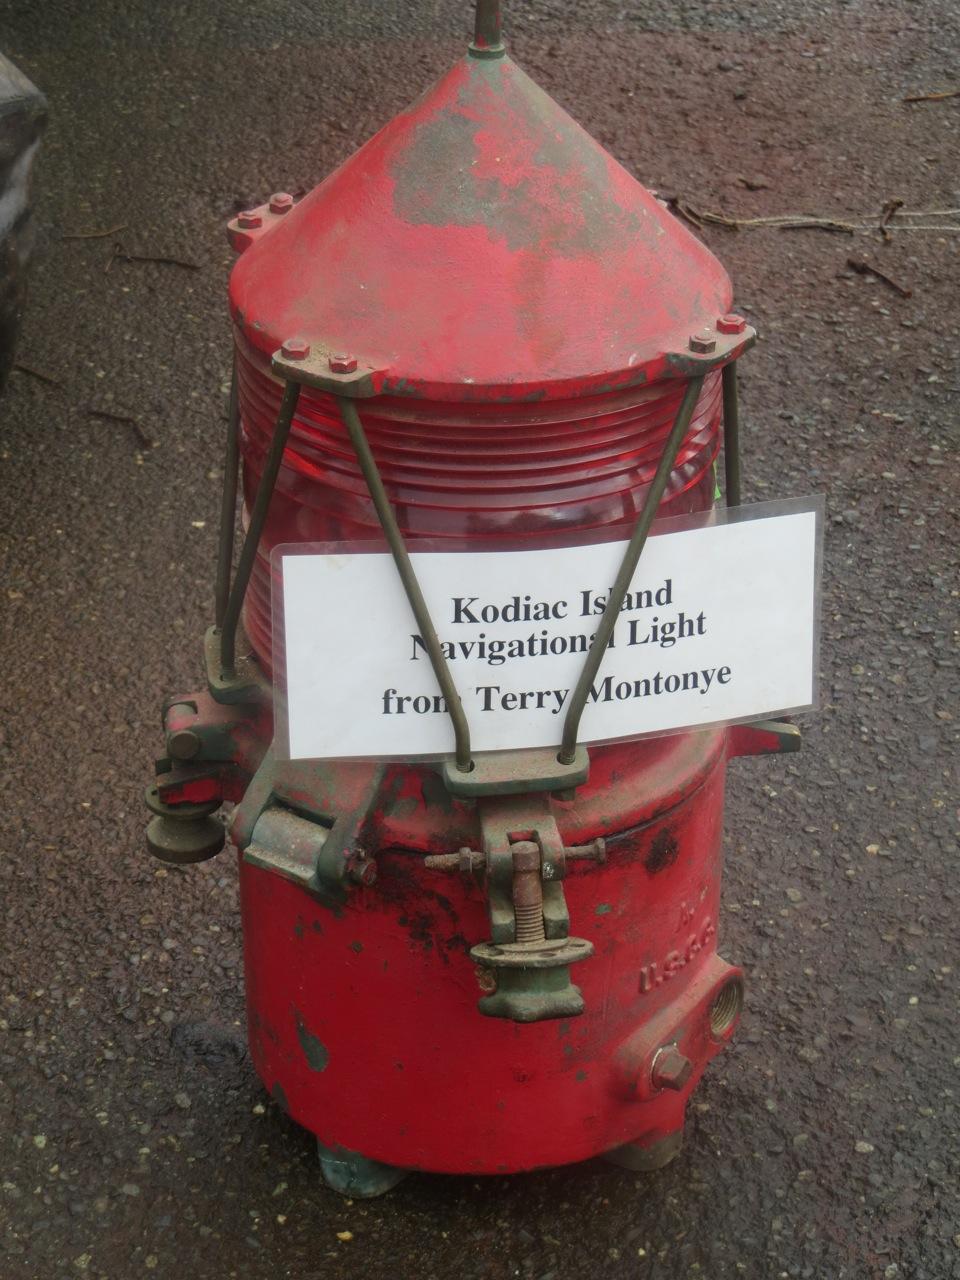 Kodiac Island Navigational Light